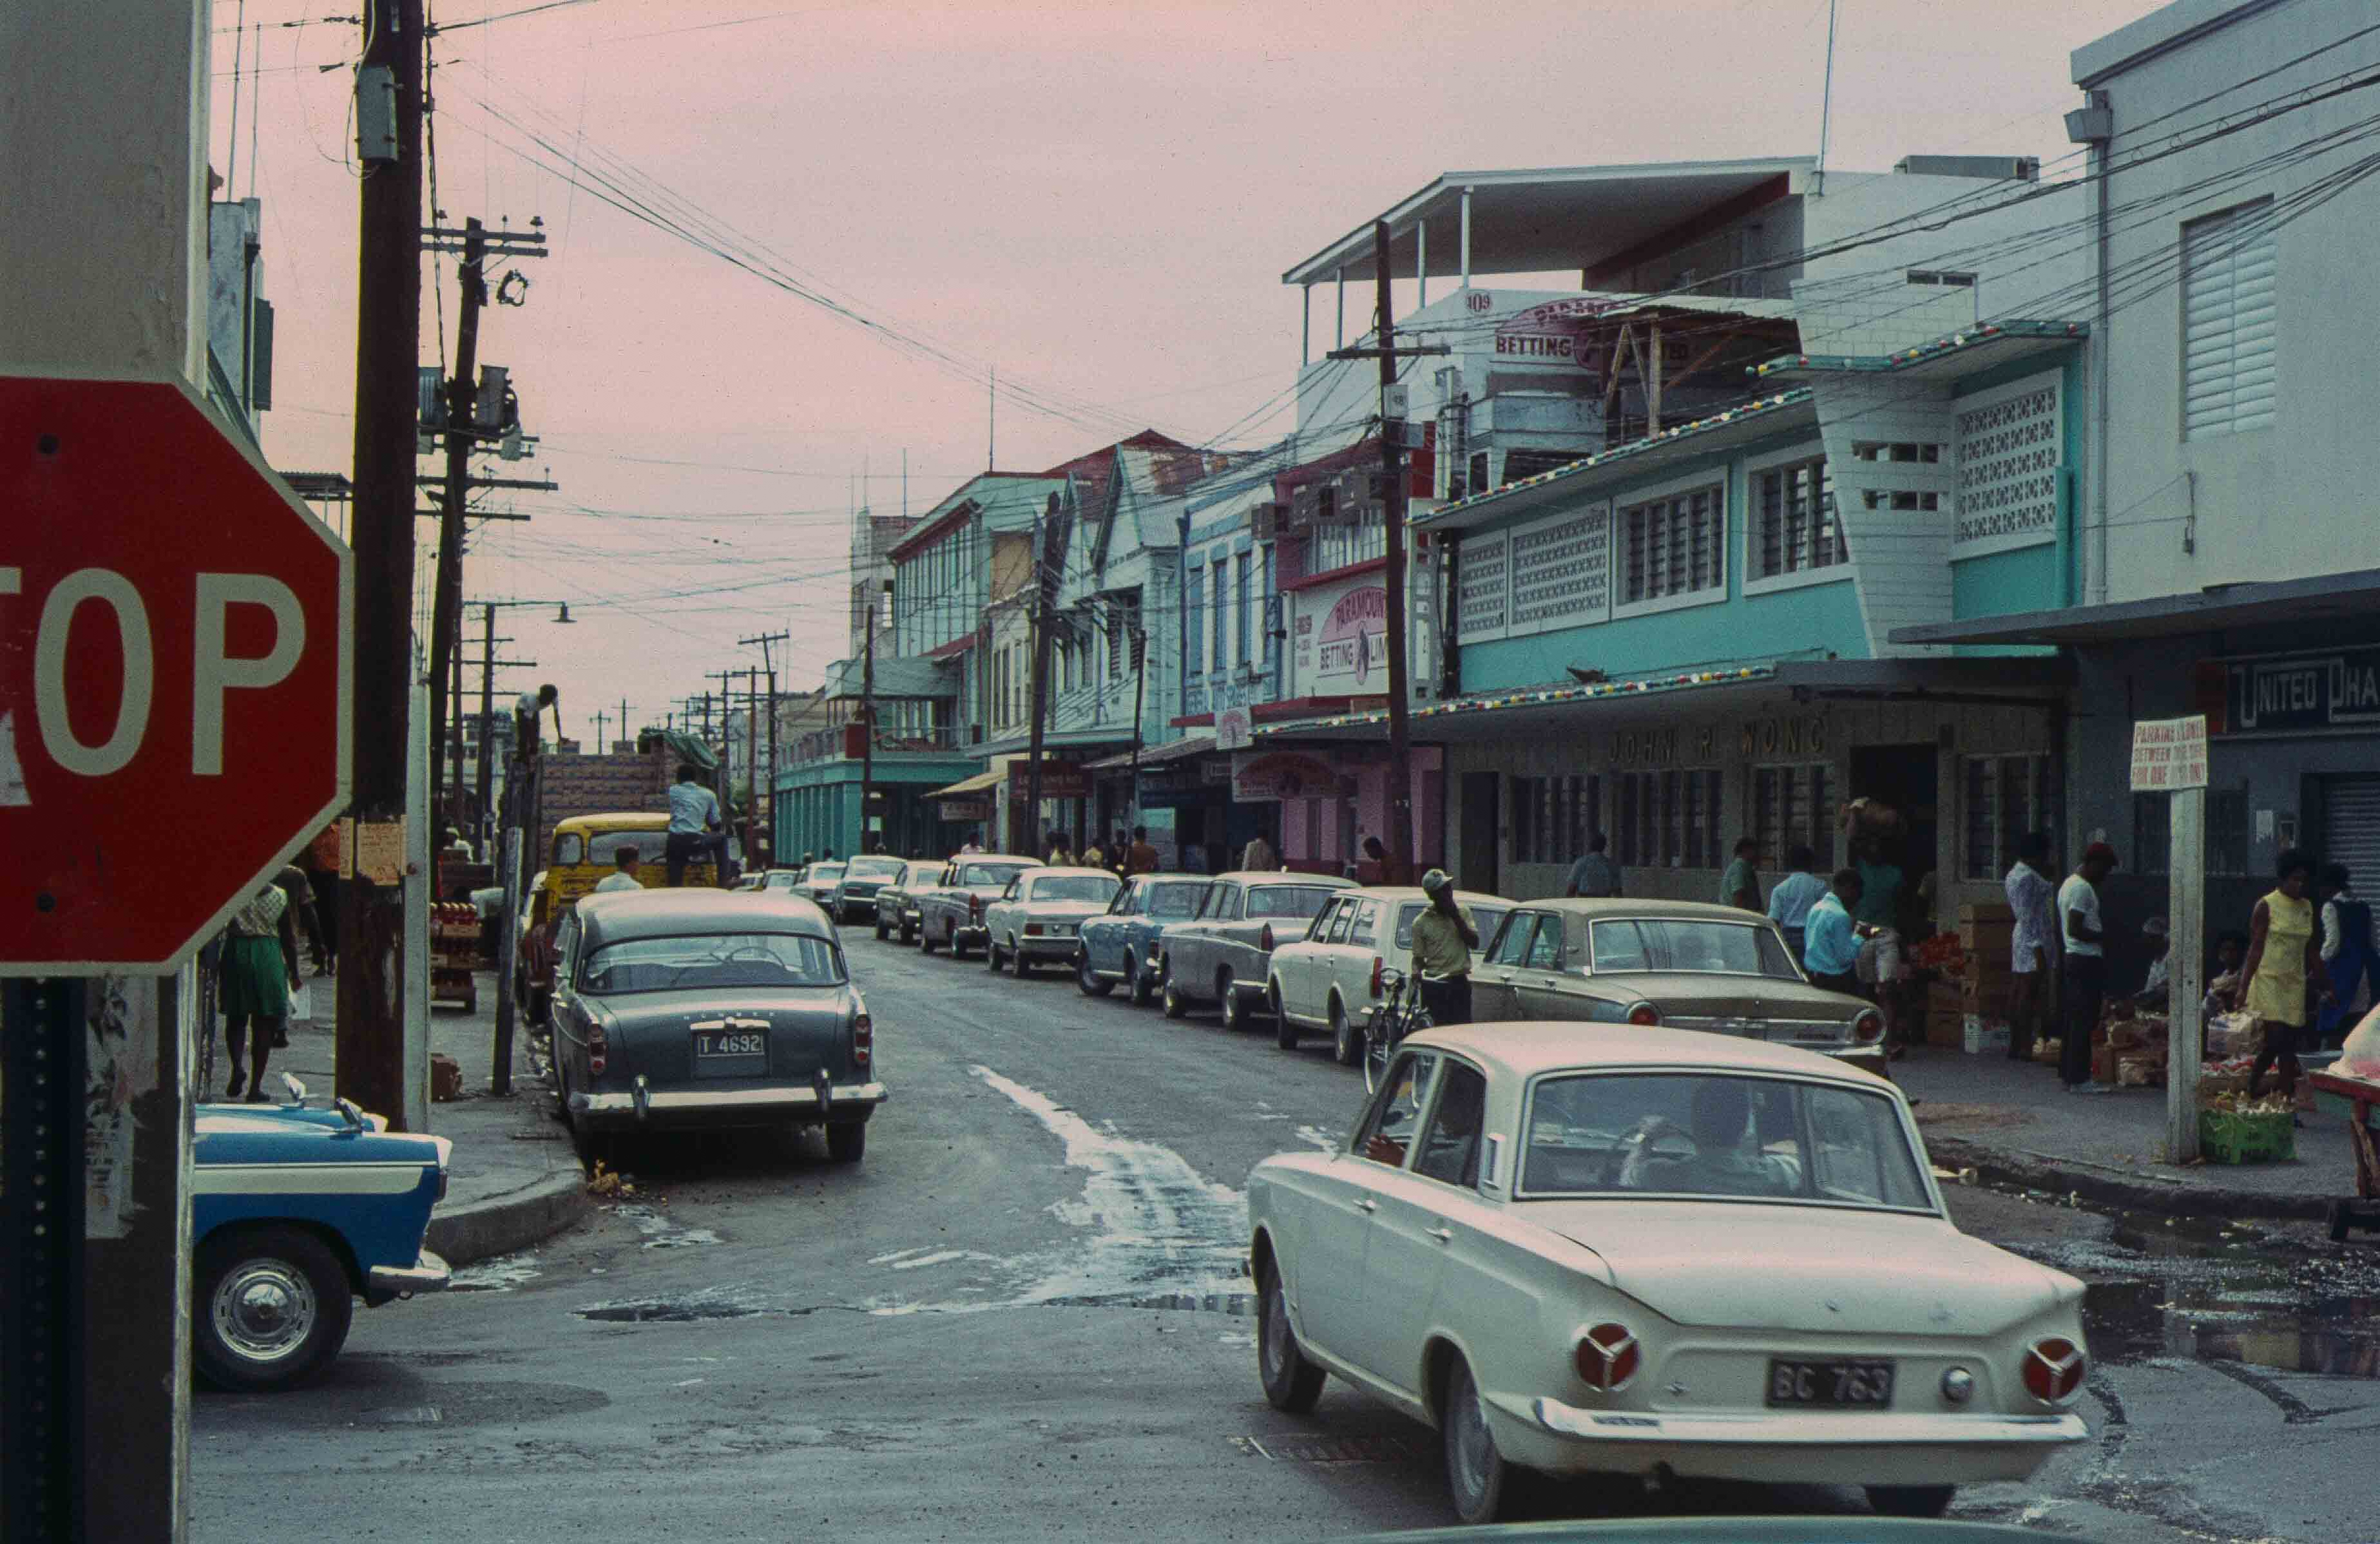 674. Suriname